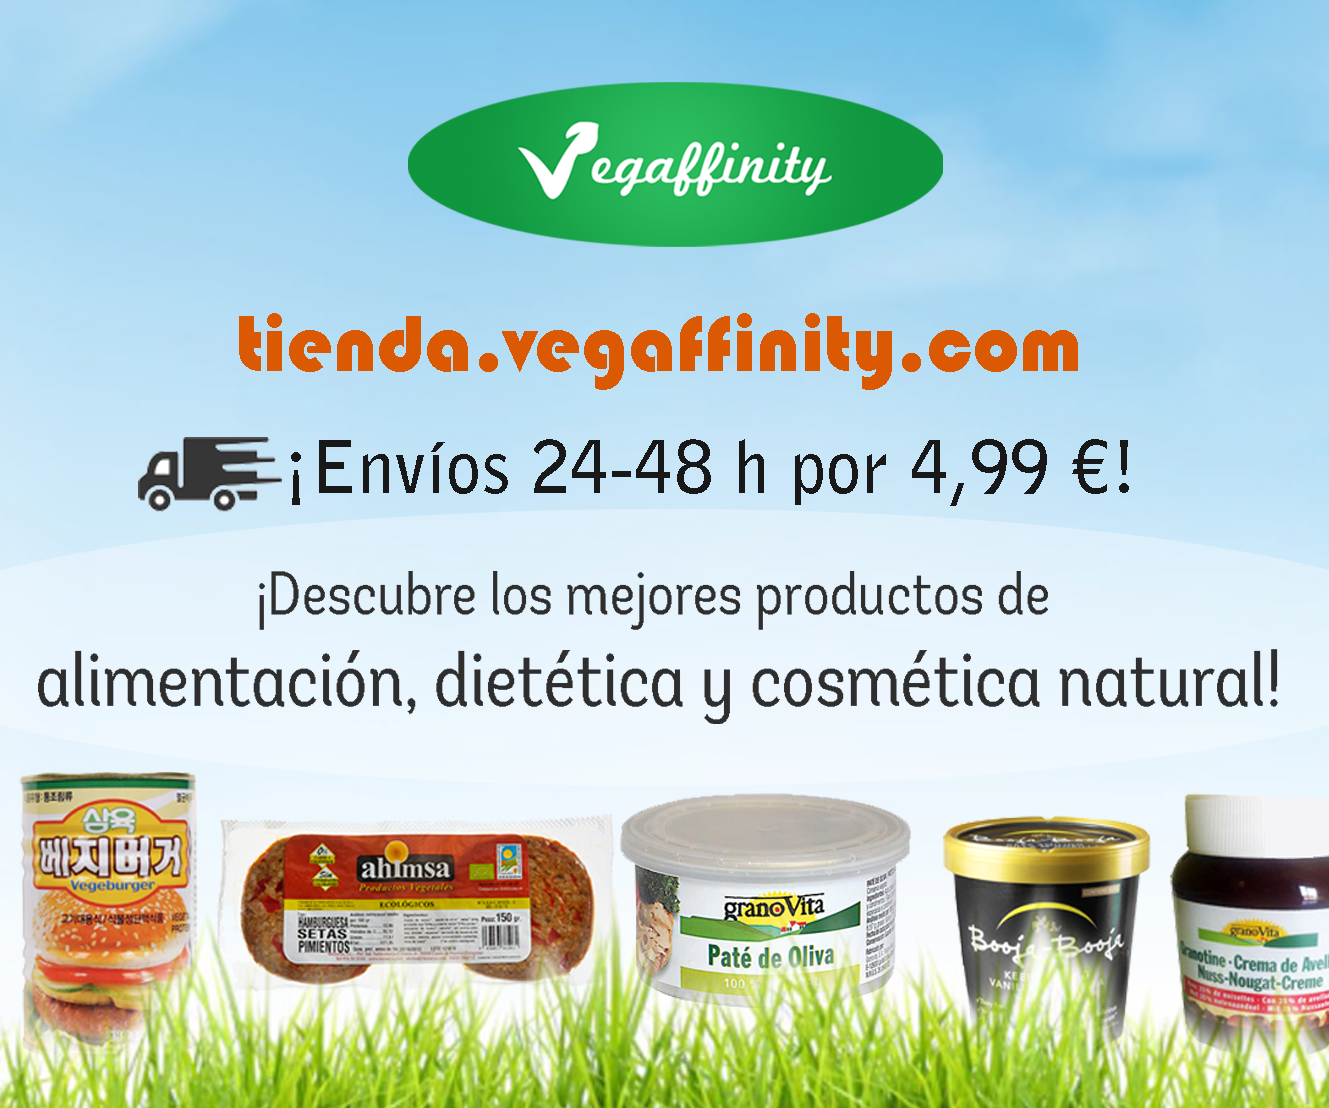 Compra tus productos en Vegaffinity